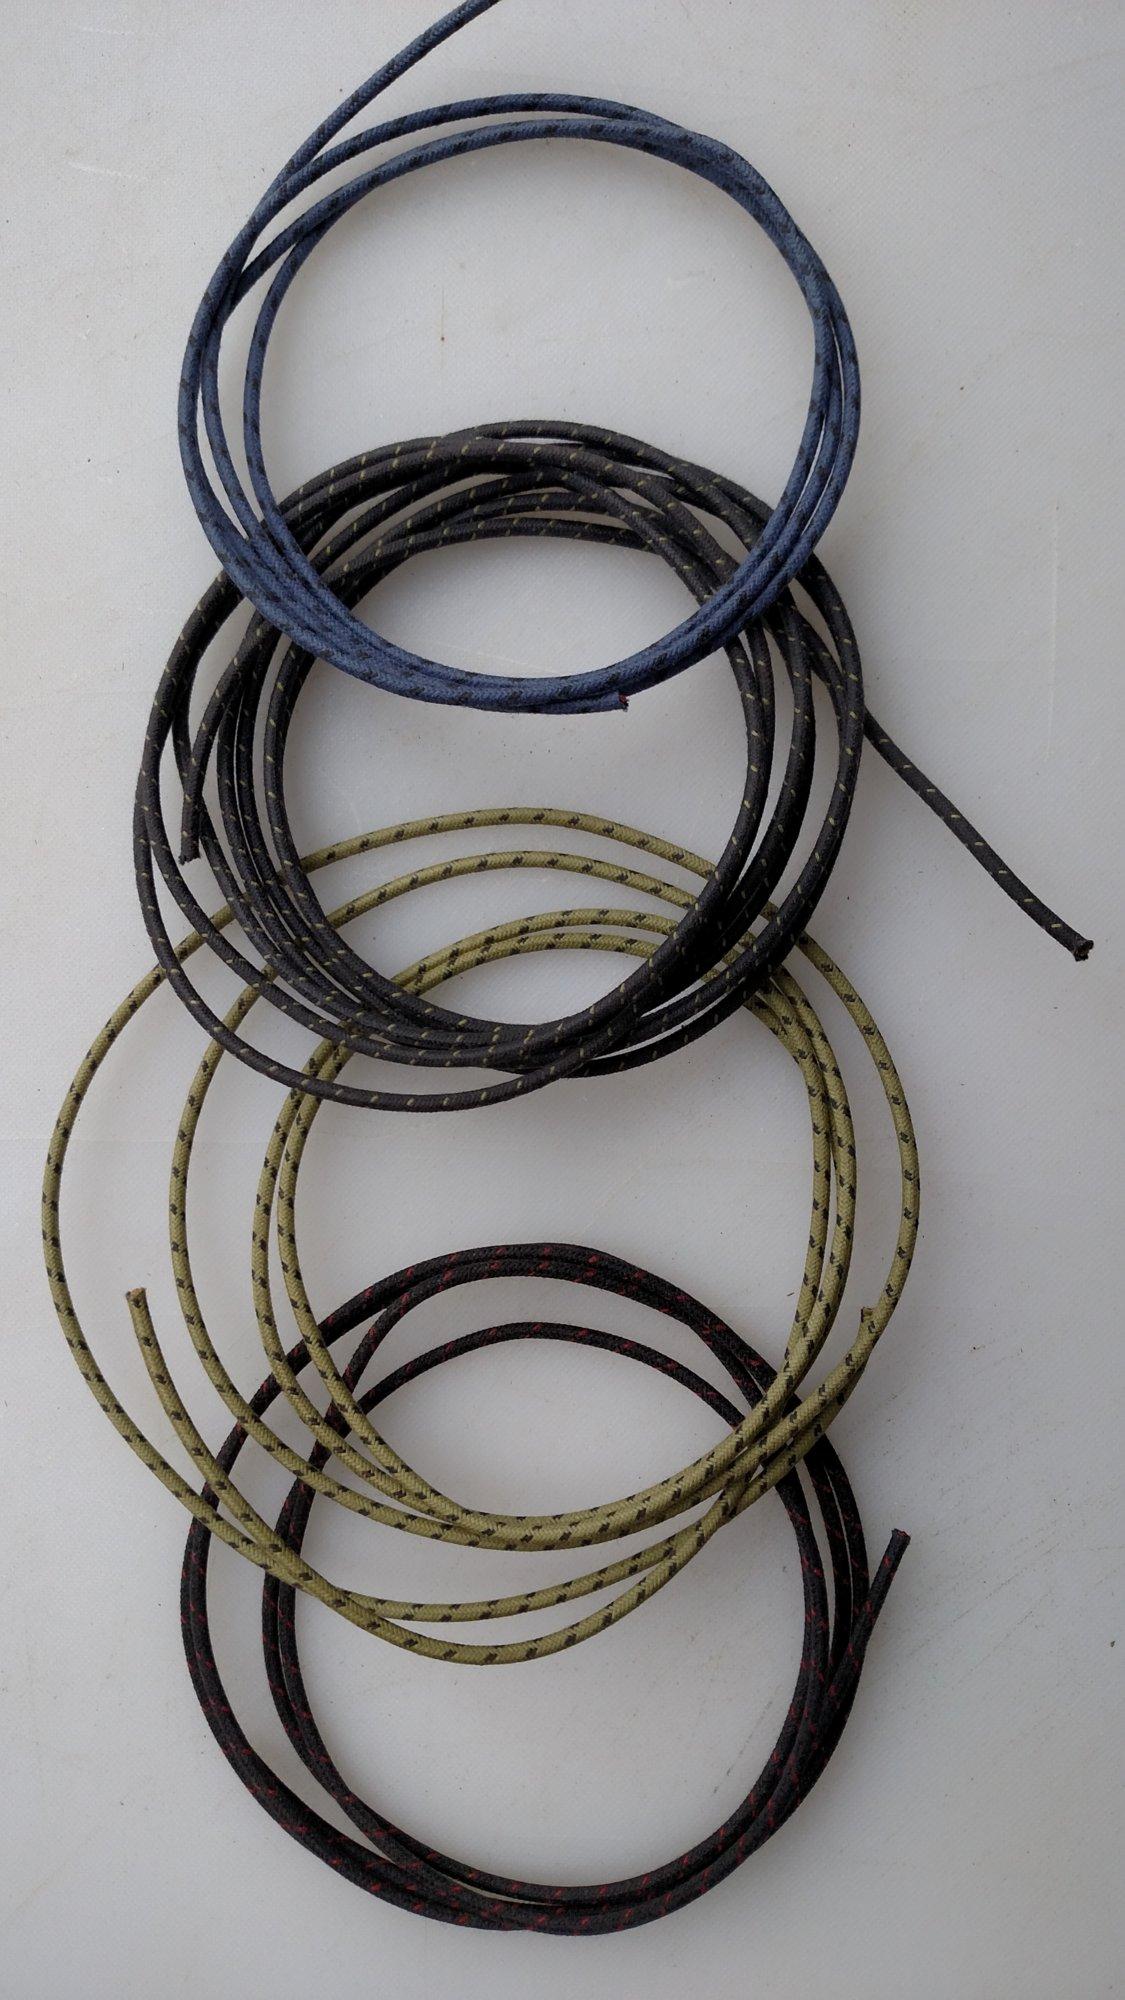 cloth wire.jpg